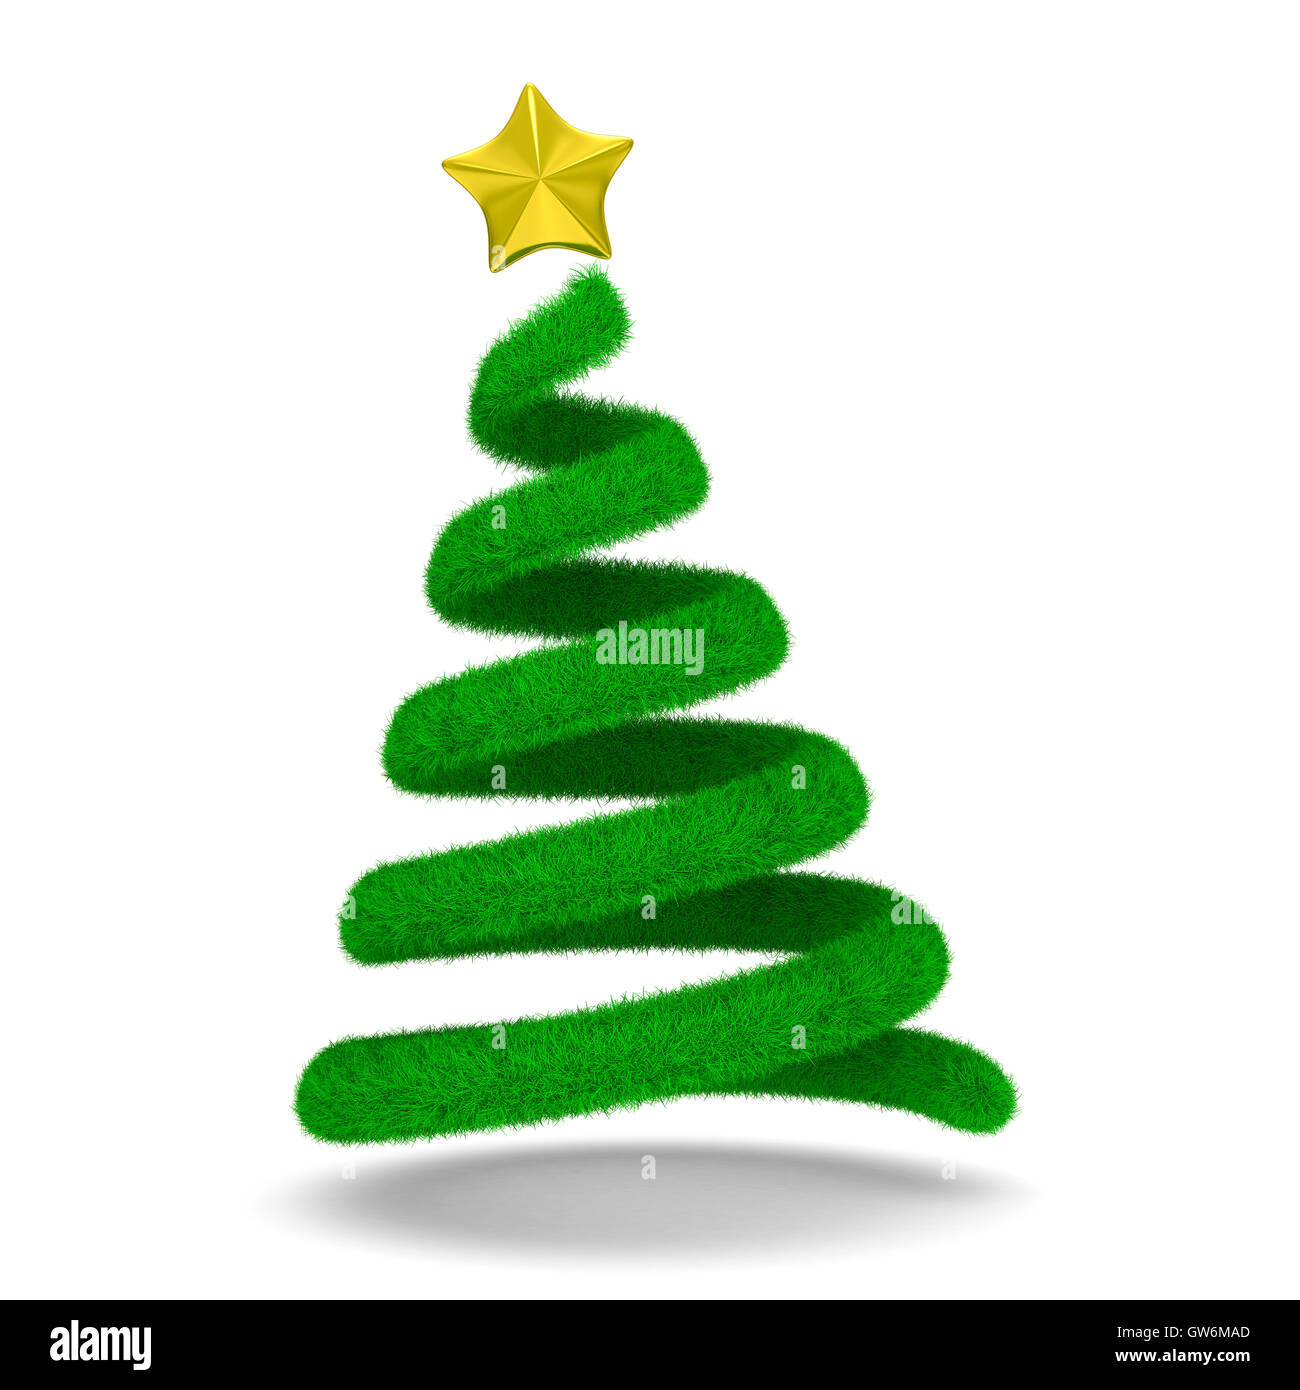 Gold Spiral Christmas Tree On Stock Photos & Gold Spiral Christmas ...